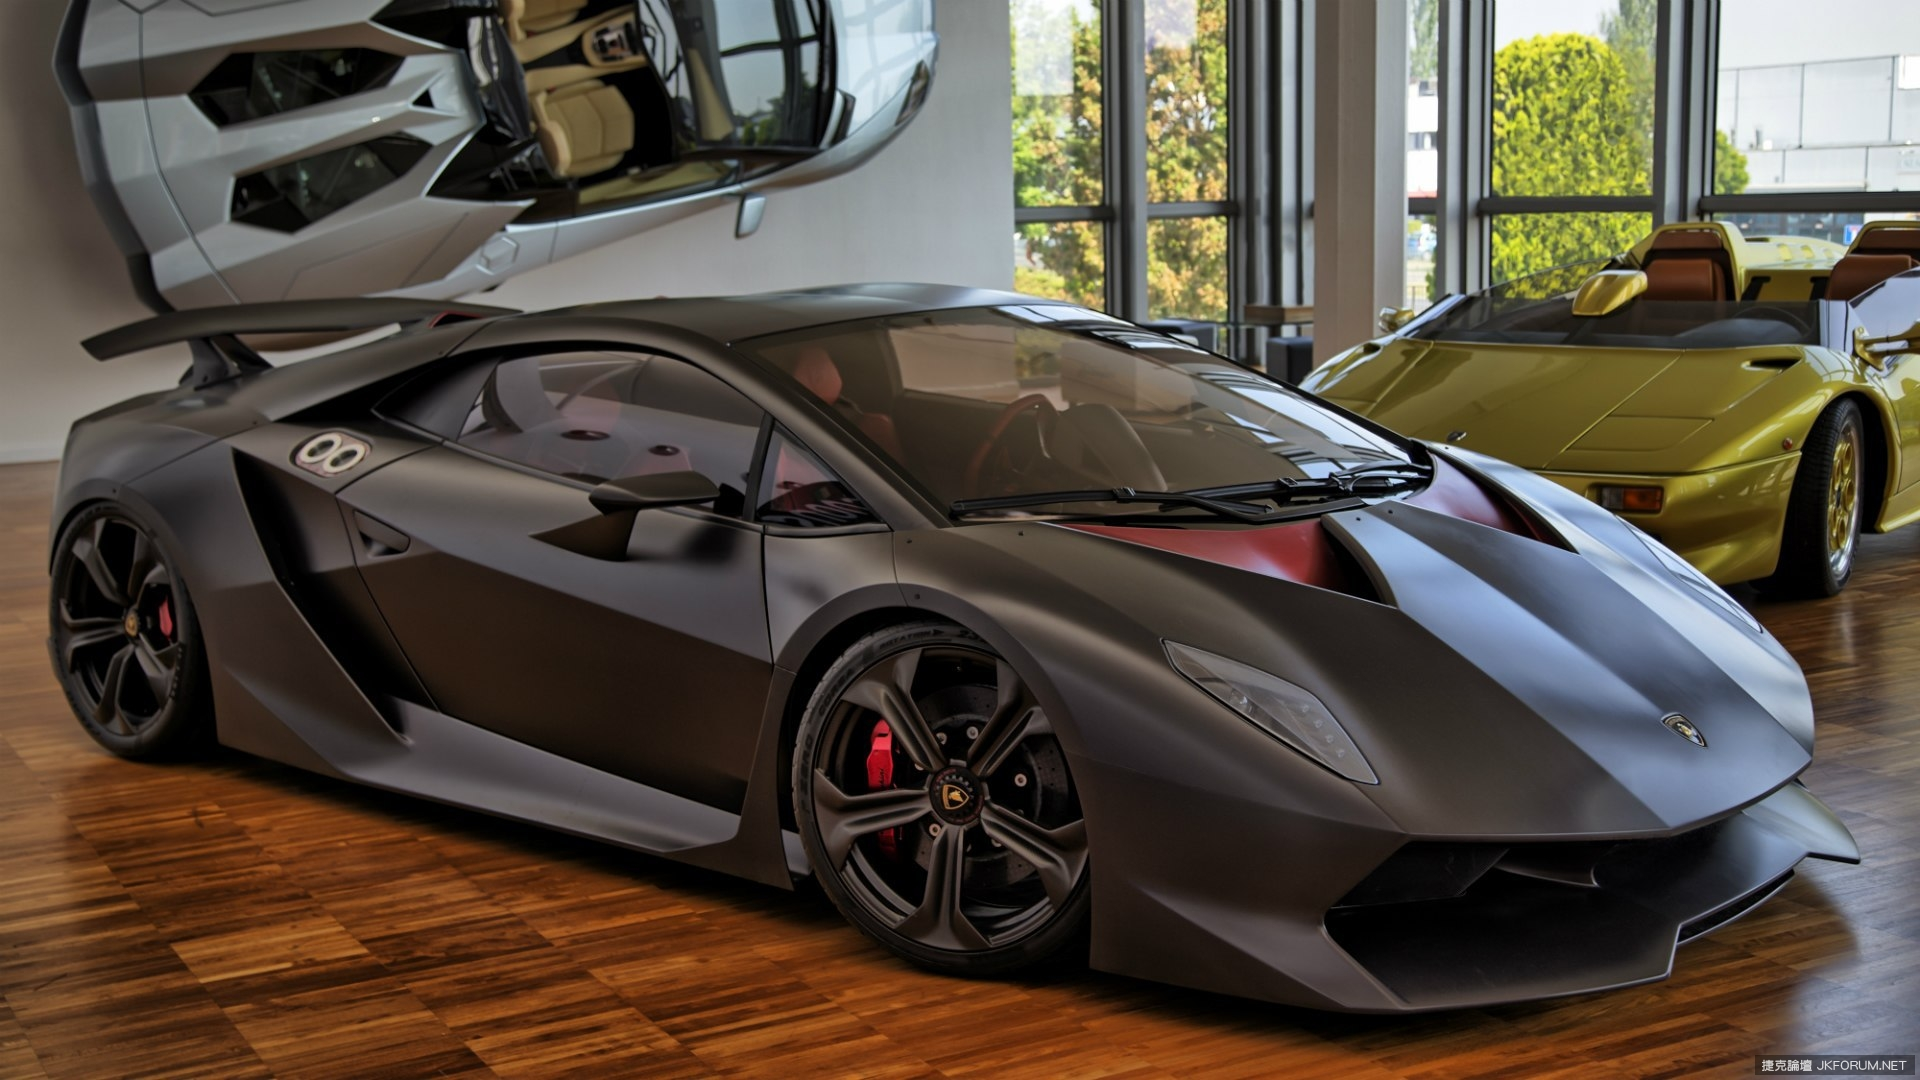 Auto___Lamborghini_Car_Lamborghini_Sesto_Elemento_094692_.jpg